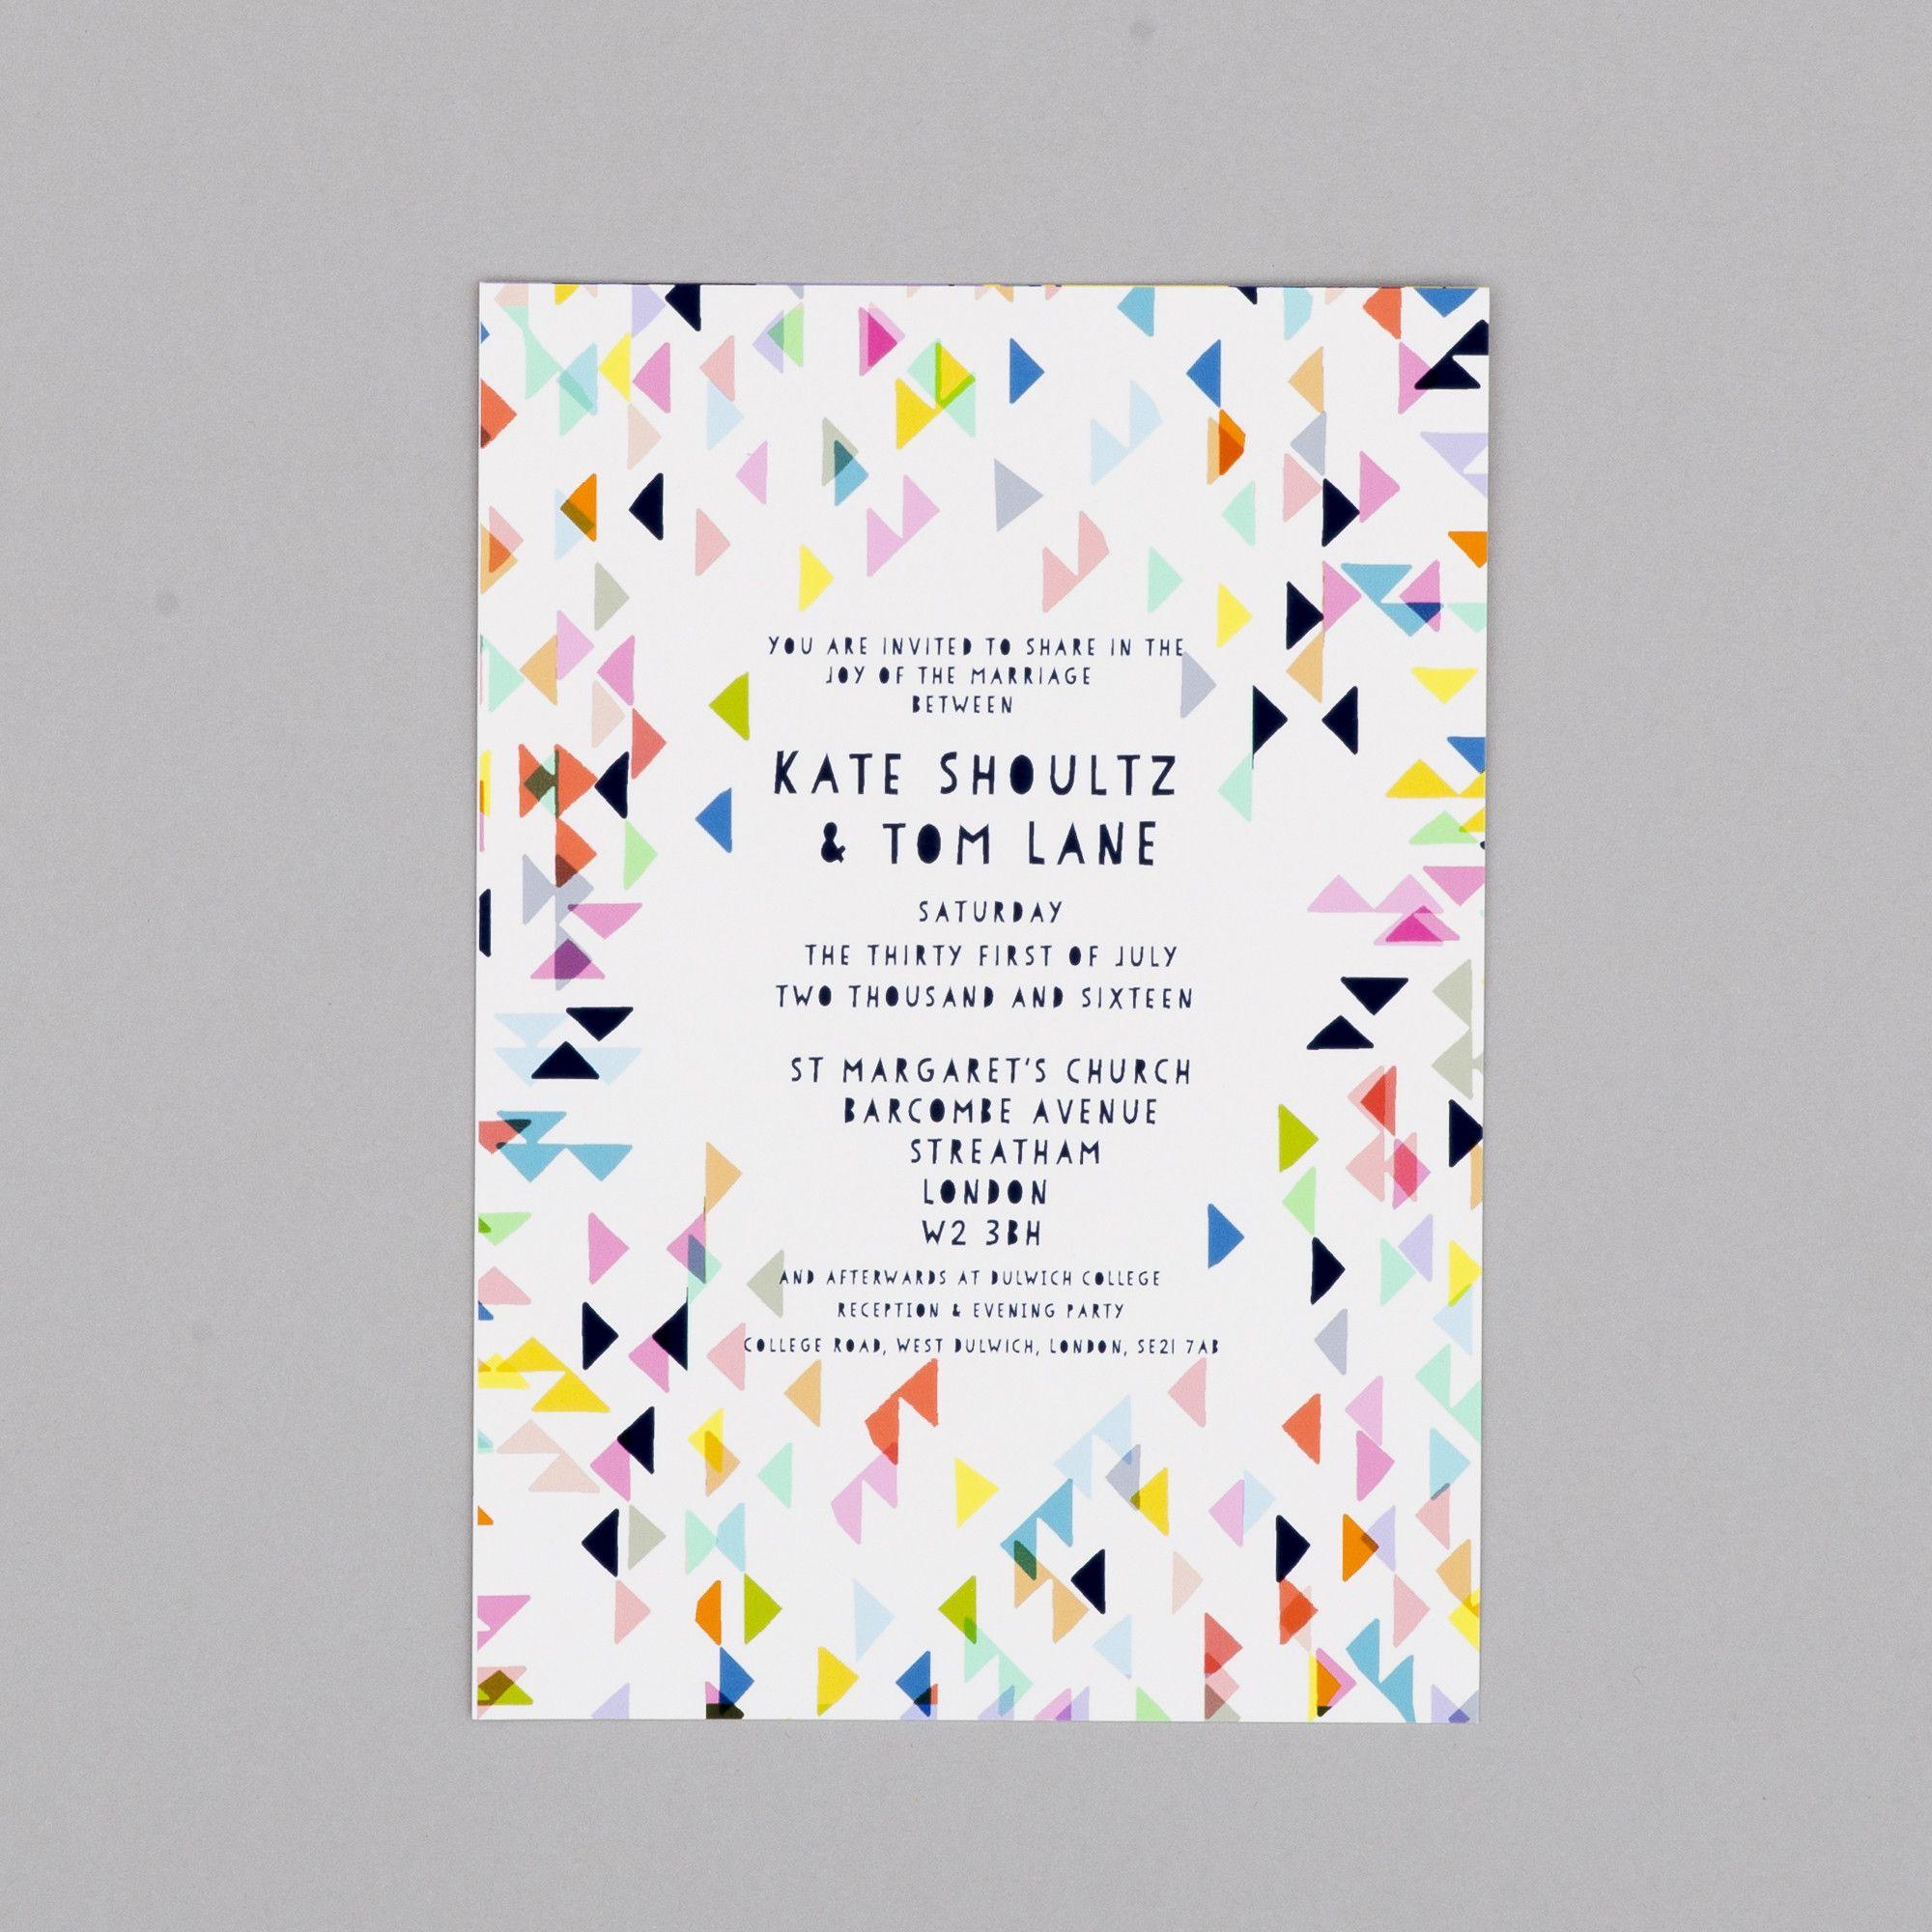 Modern Geometric Day Wedding Invitations By Kitty McCall | Geometric ...